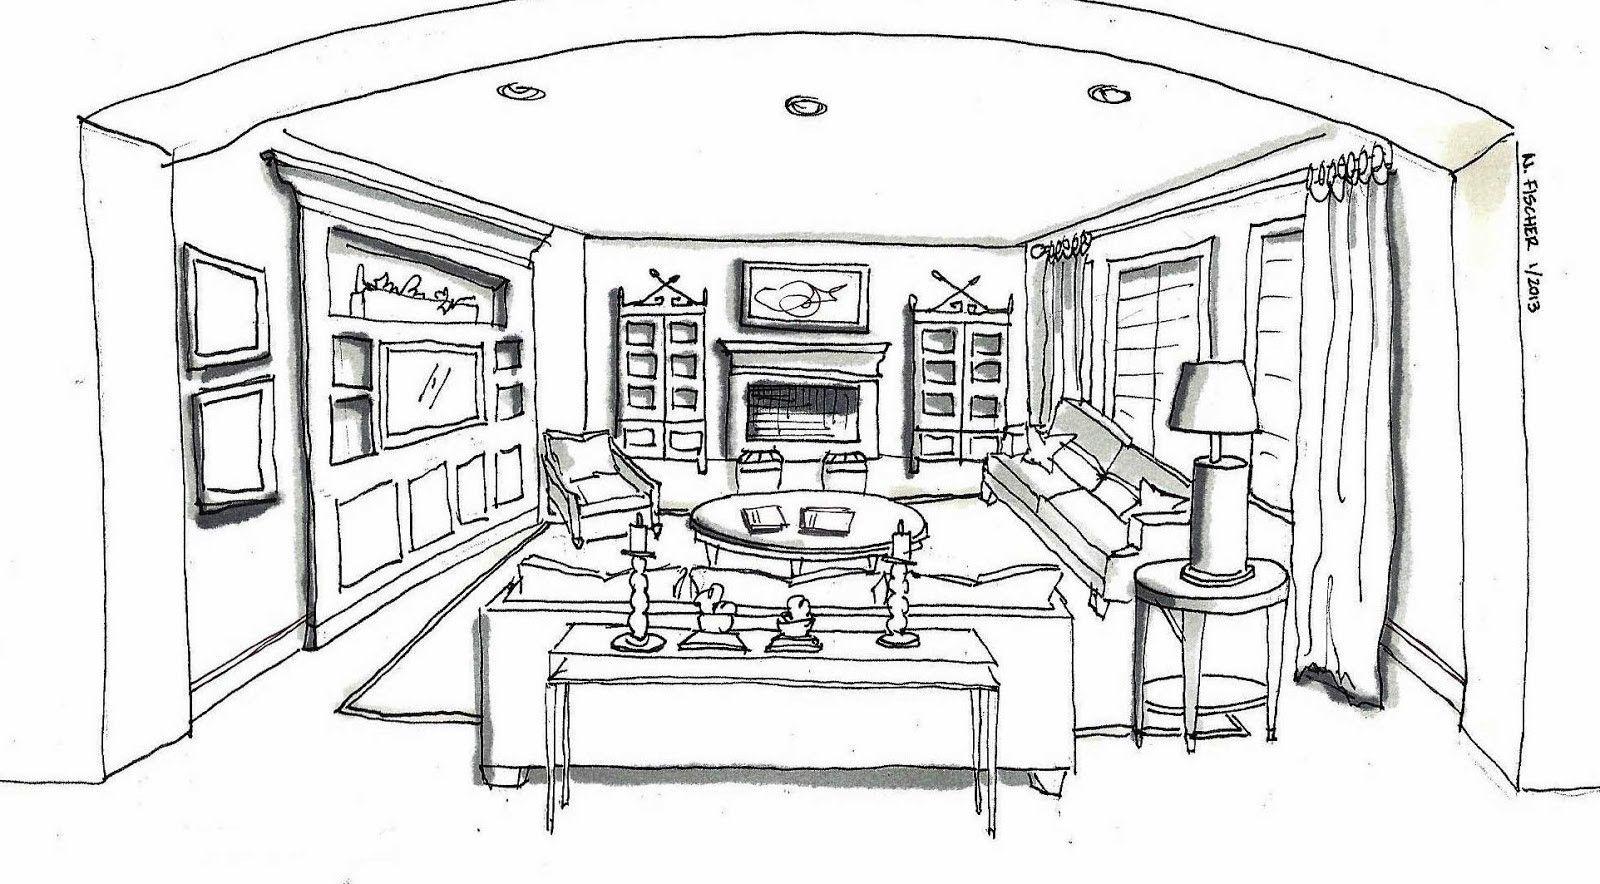 The Most Beautiful Living Room Architecture Sketch Freshouz Com Interior Design Sketch Interior Design Sketches Design Sketch